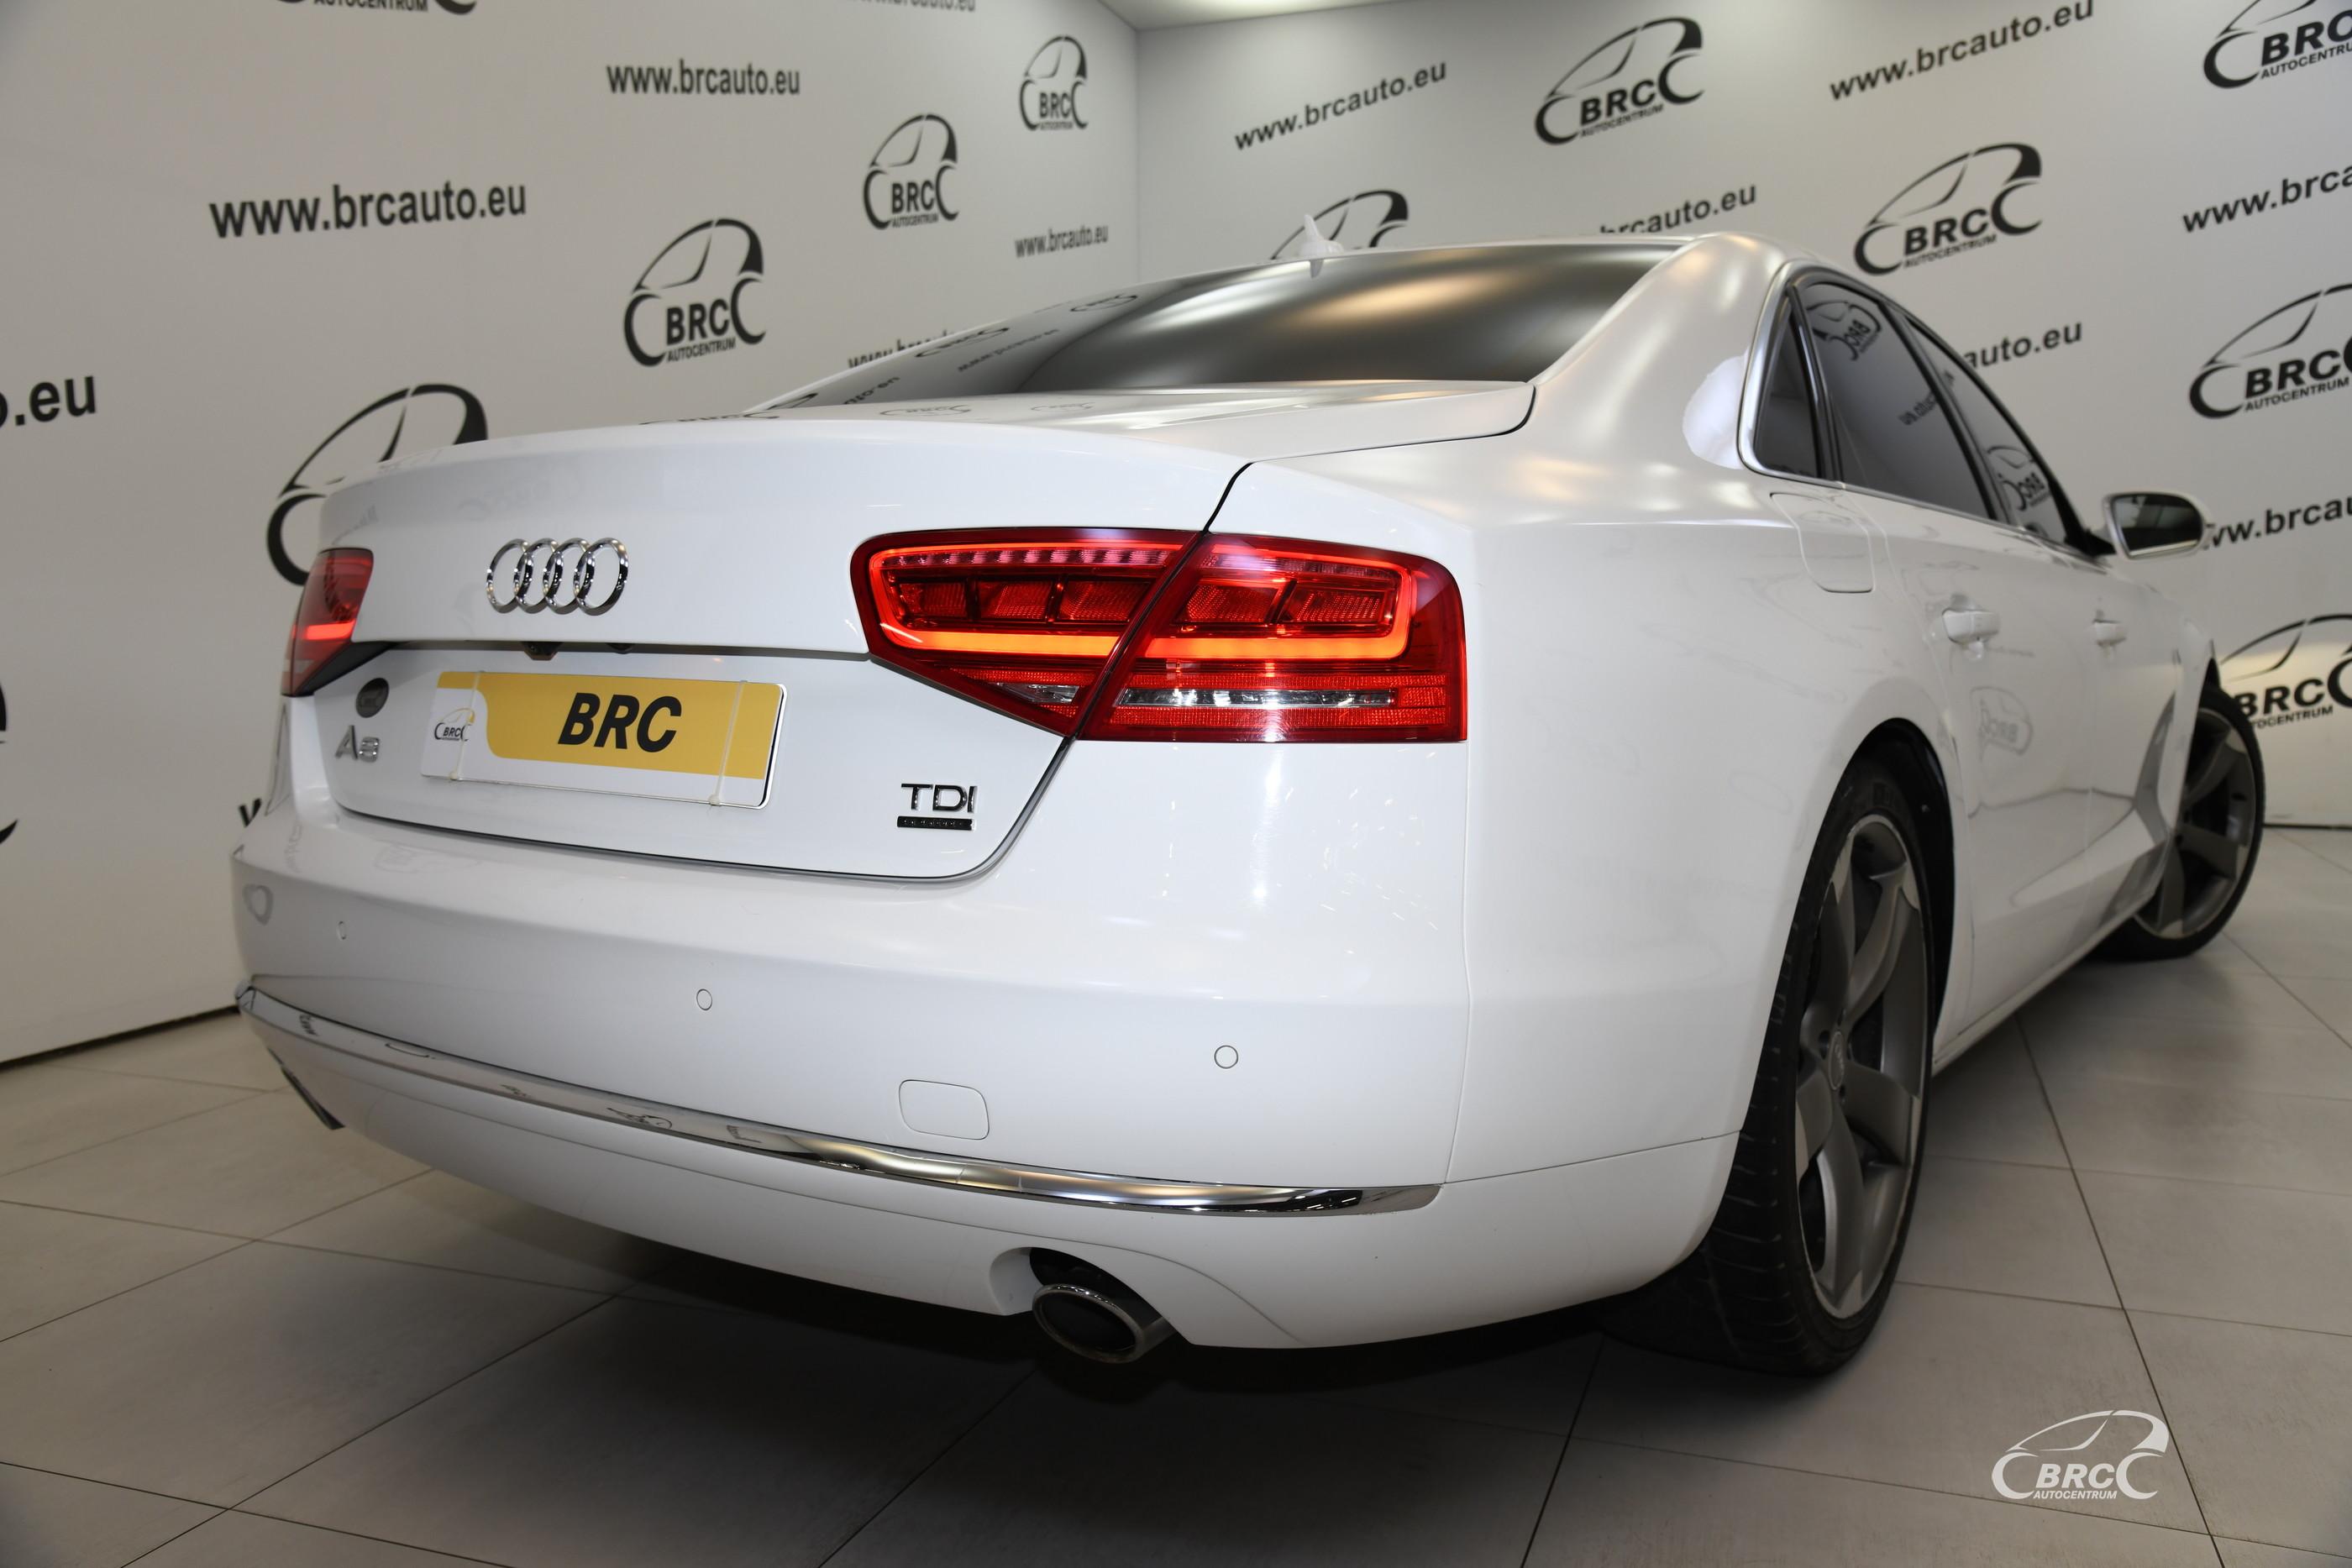 Audi A8 4.2 V8 TDI Quattro Automatas